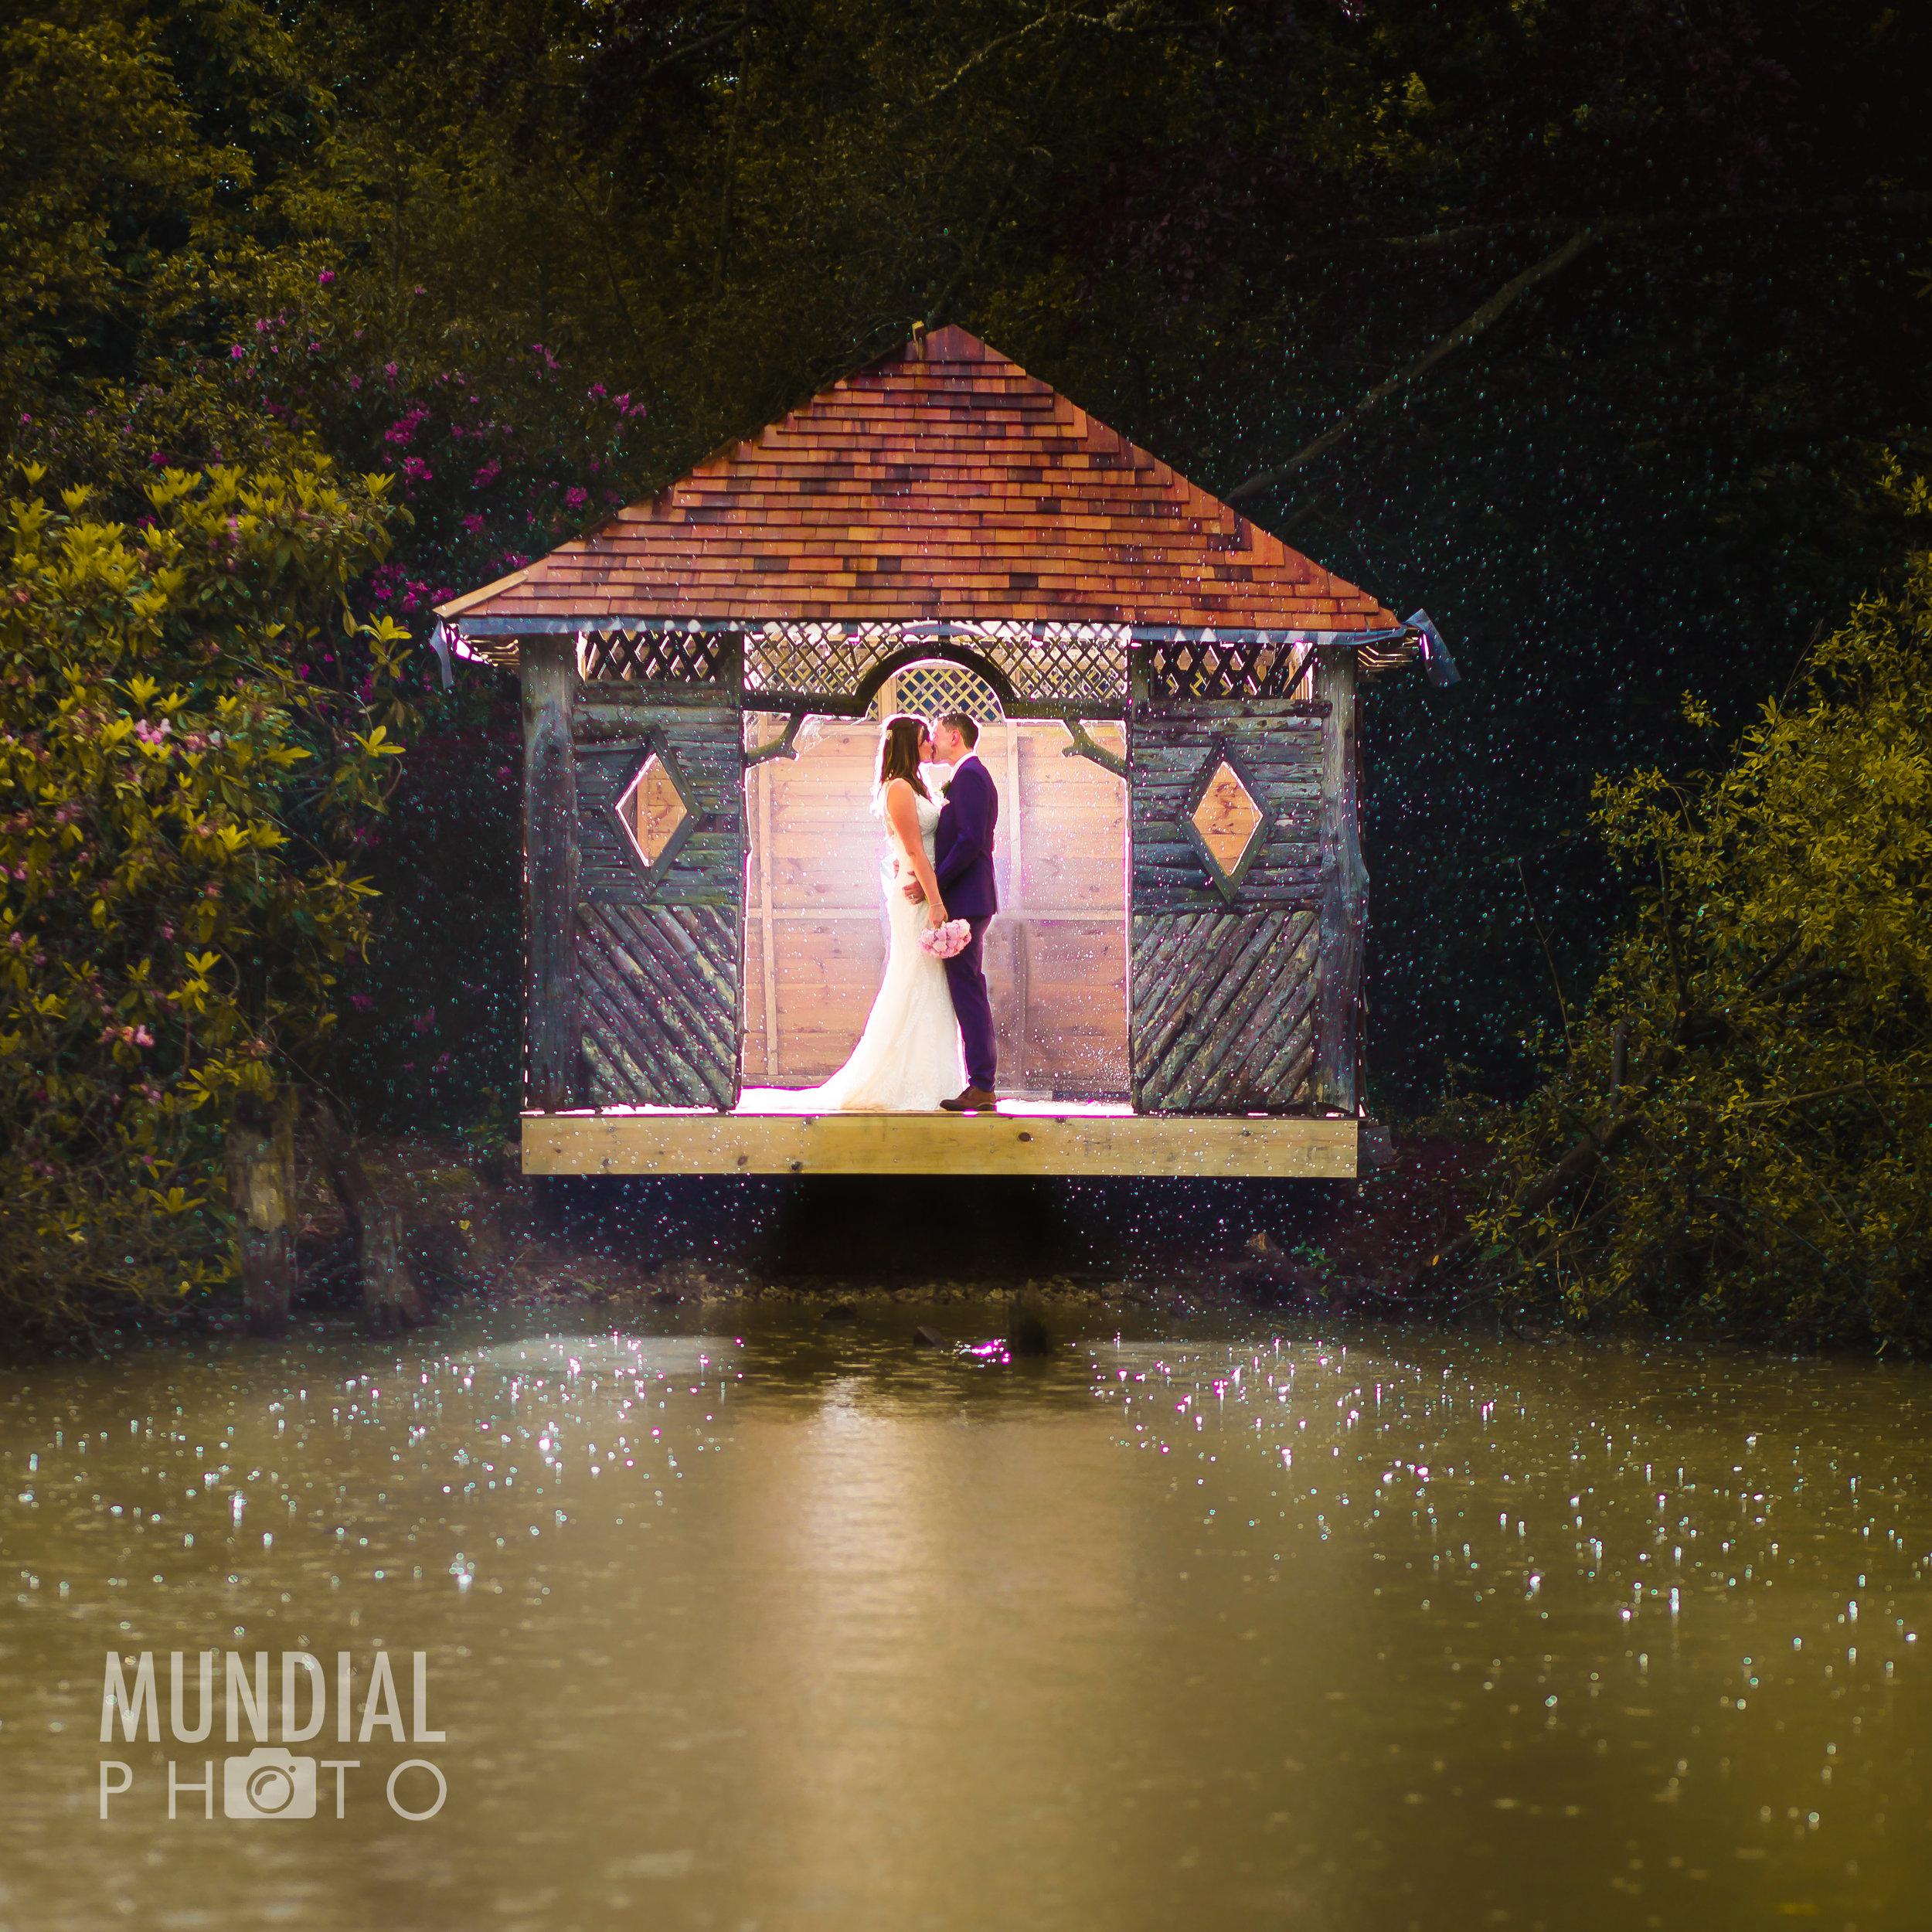 rain wedding photo-1.jpg